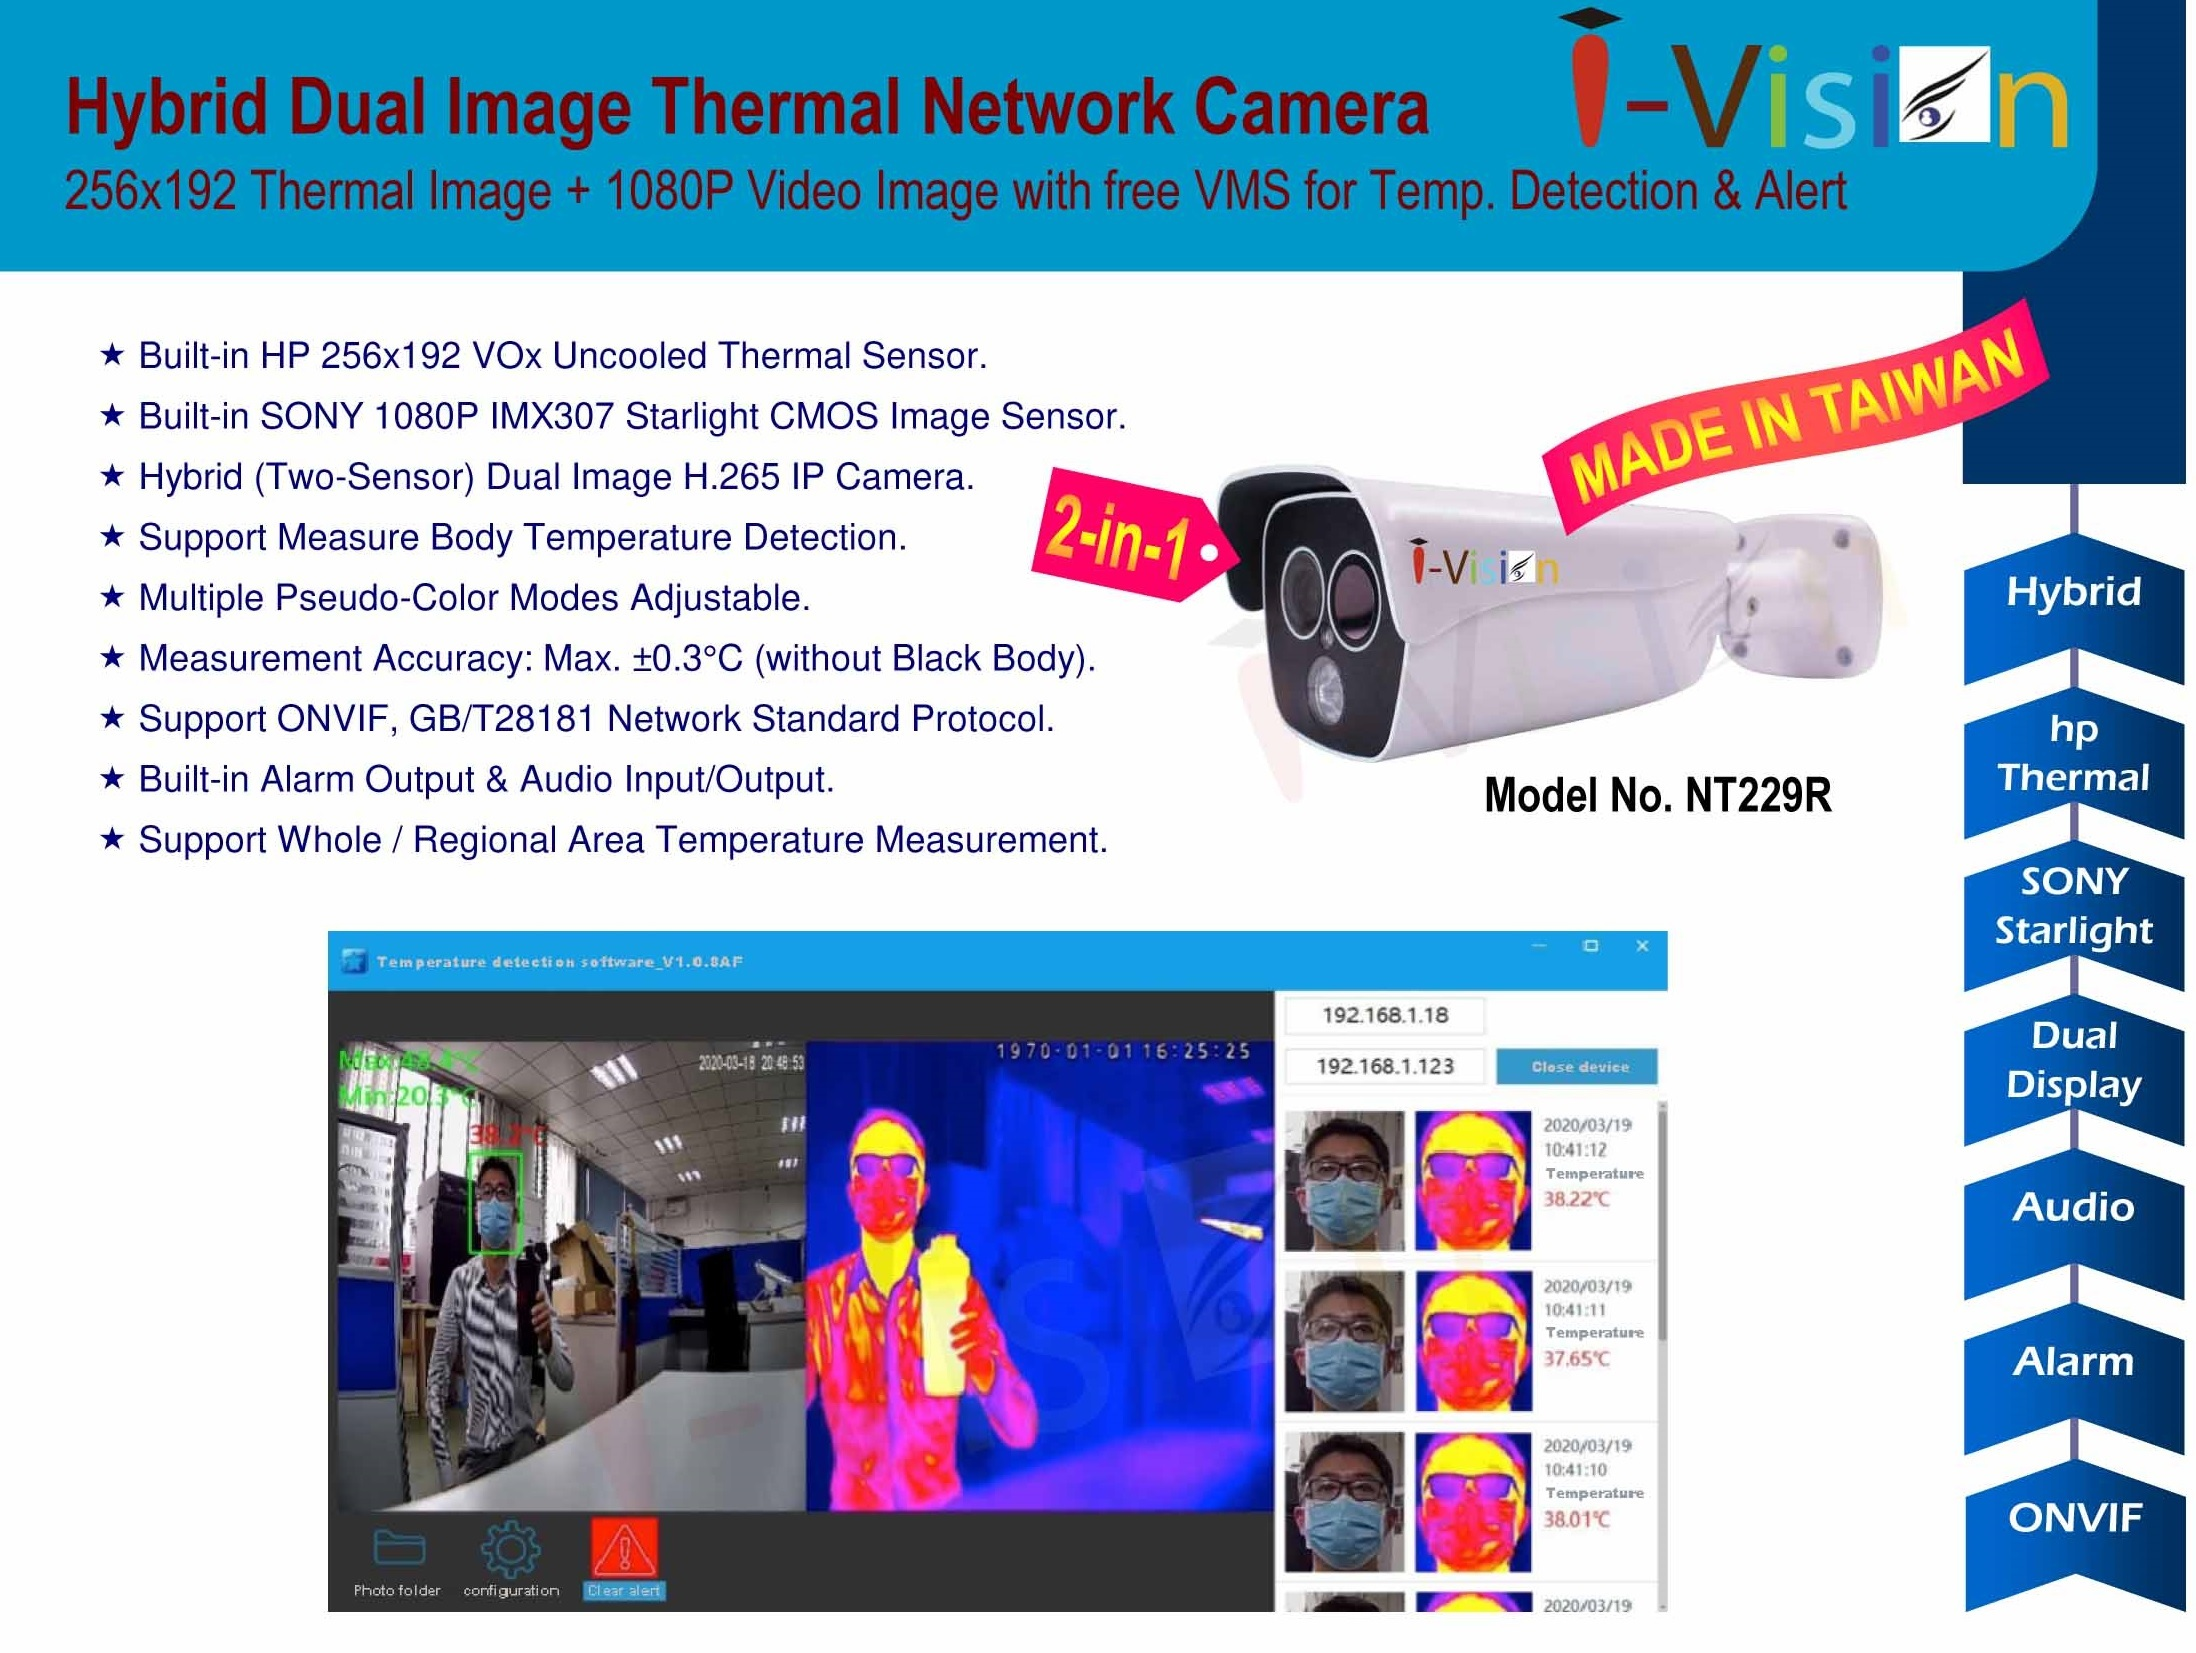 Hybrid Dual Image Thermal Network Camera